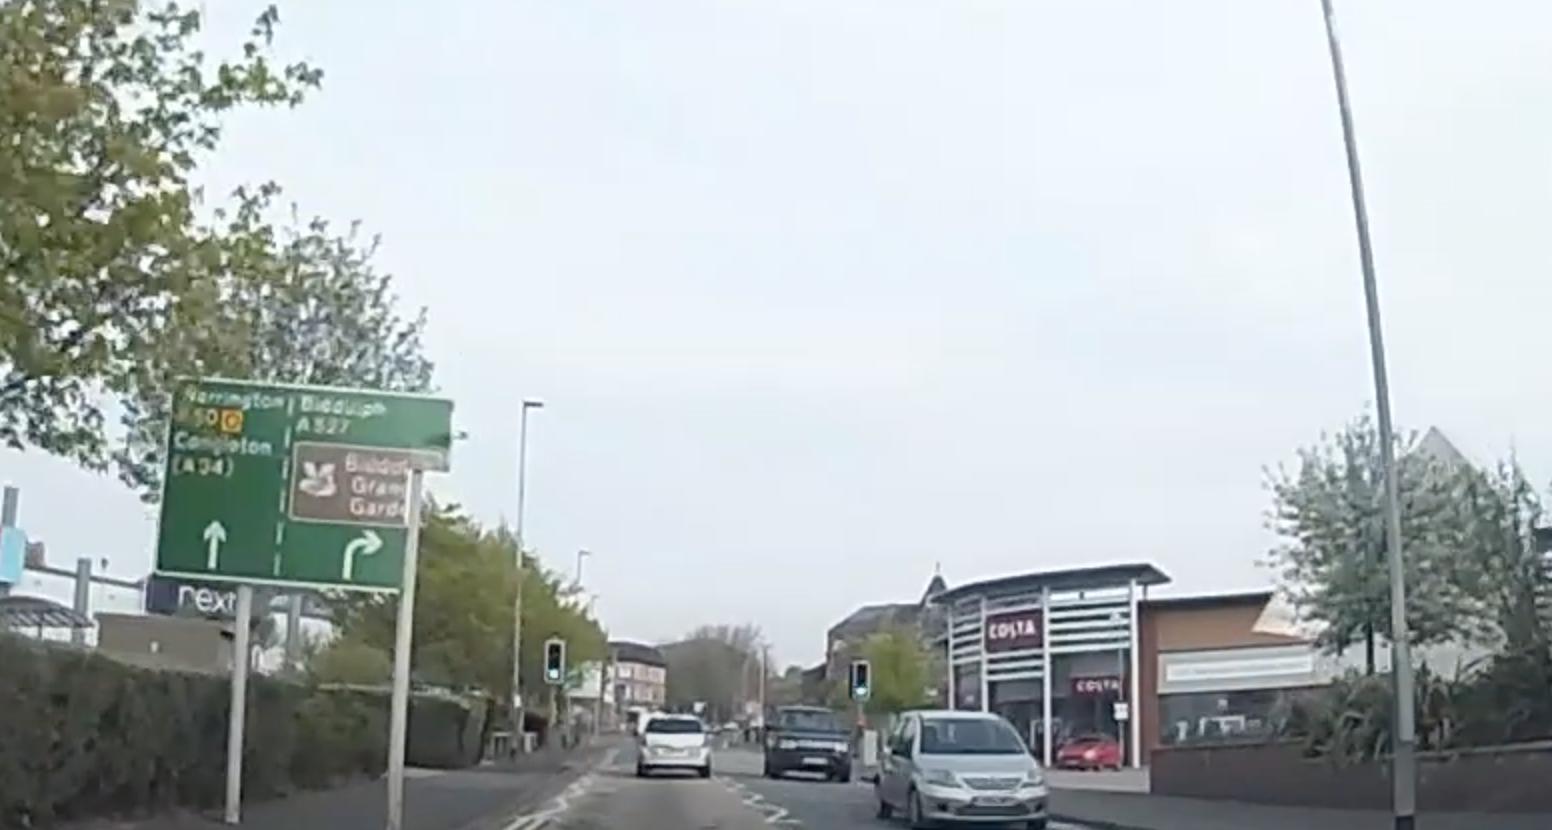 Follow signs to warrington 1